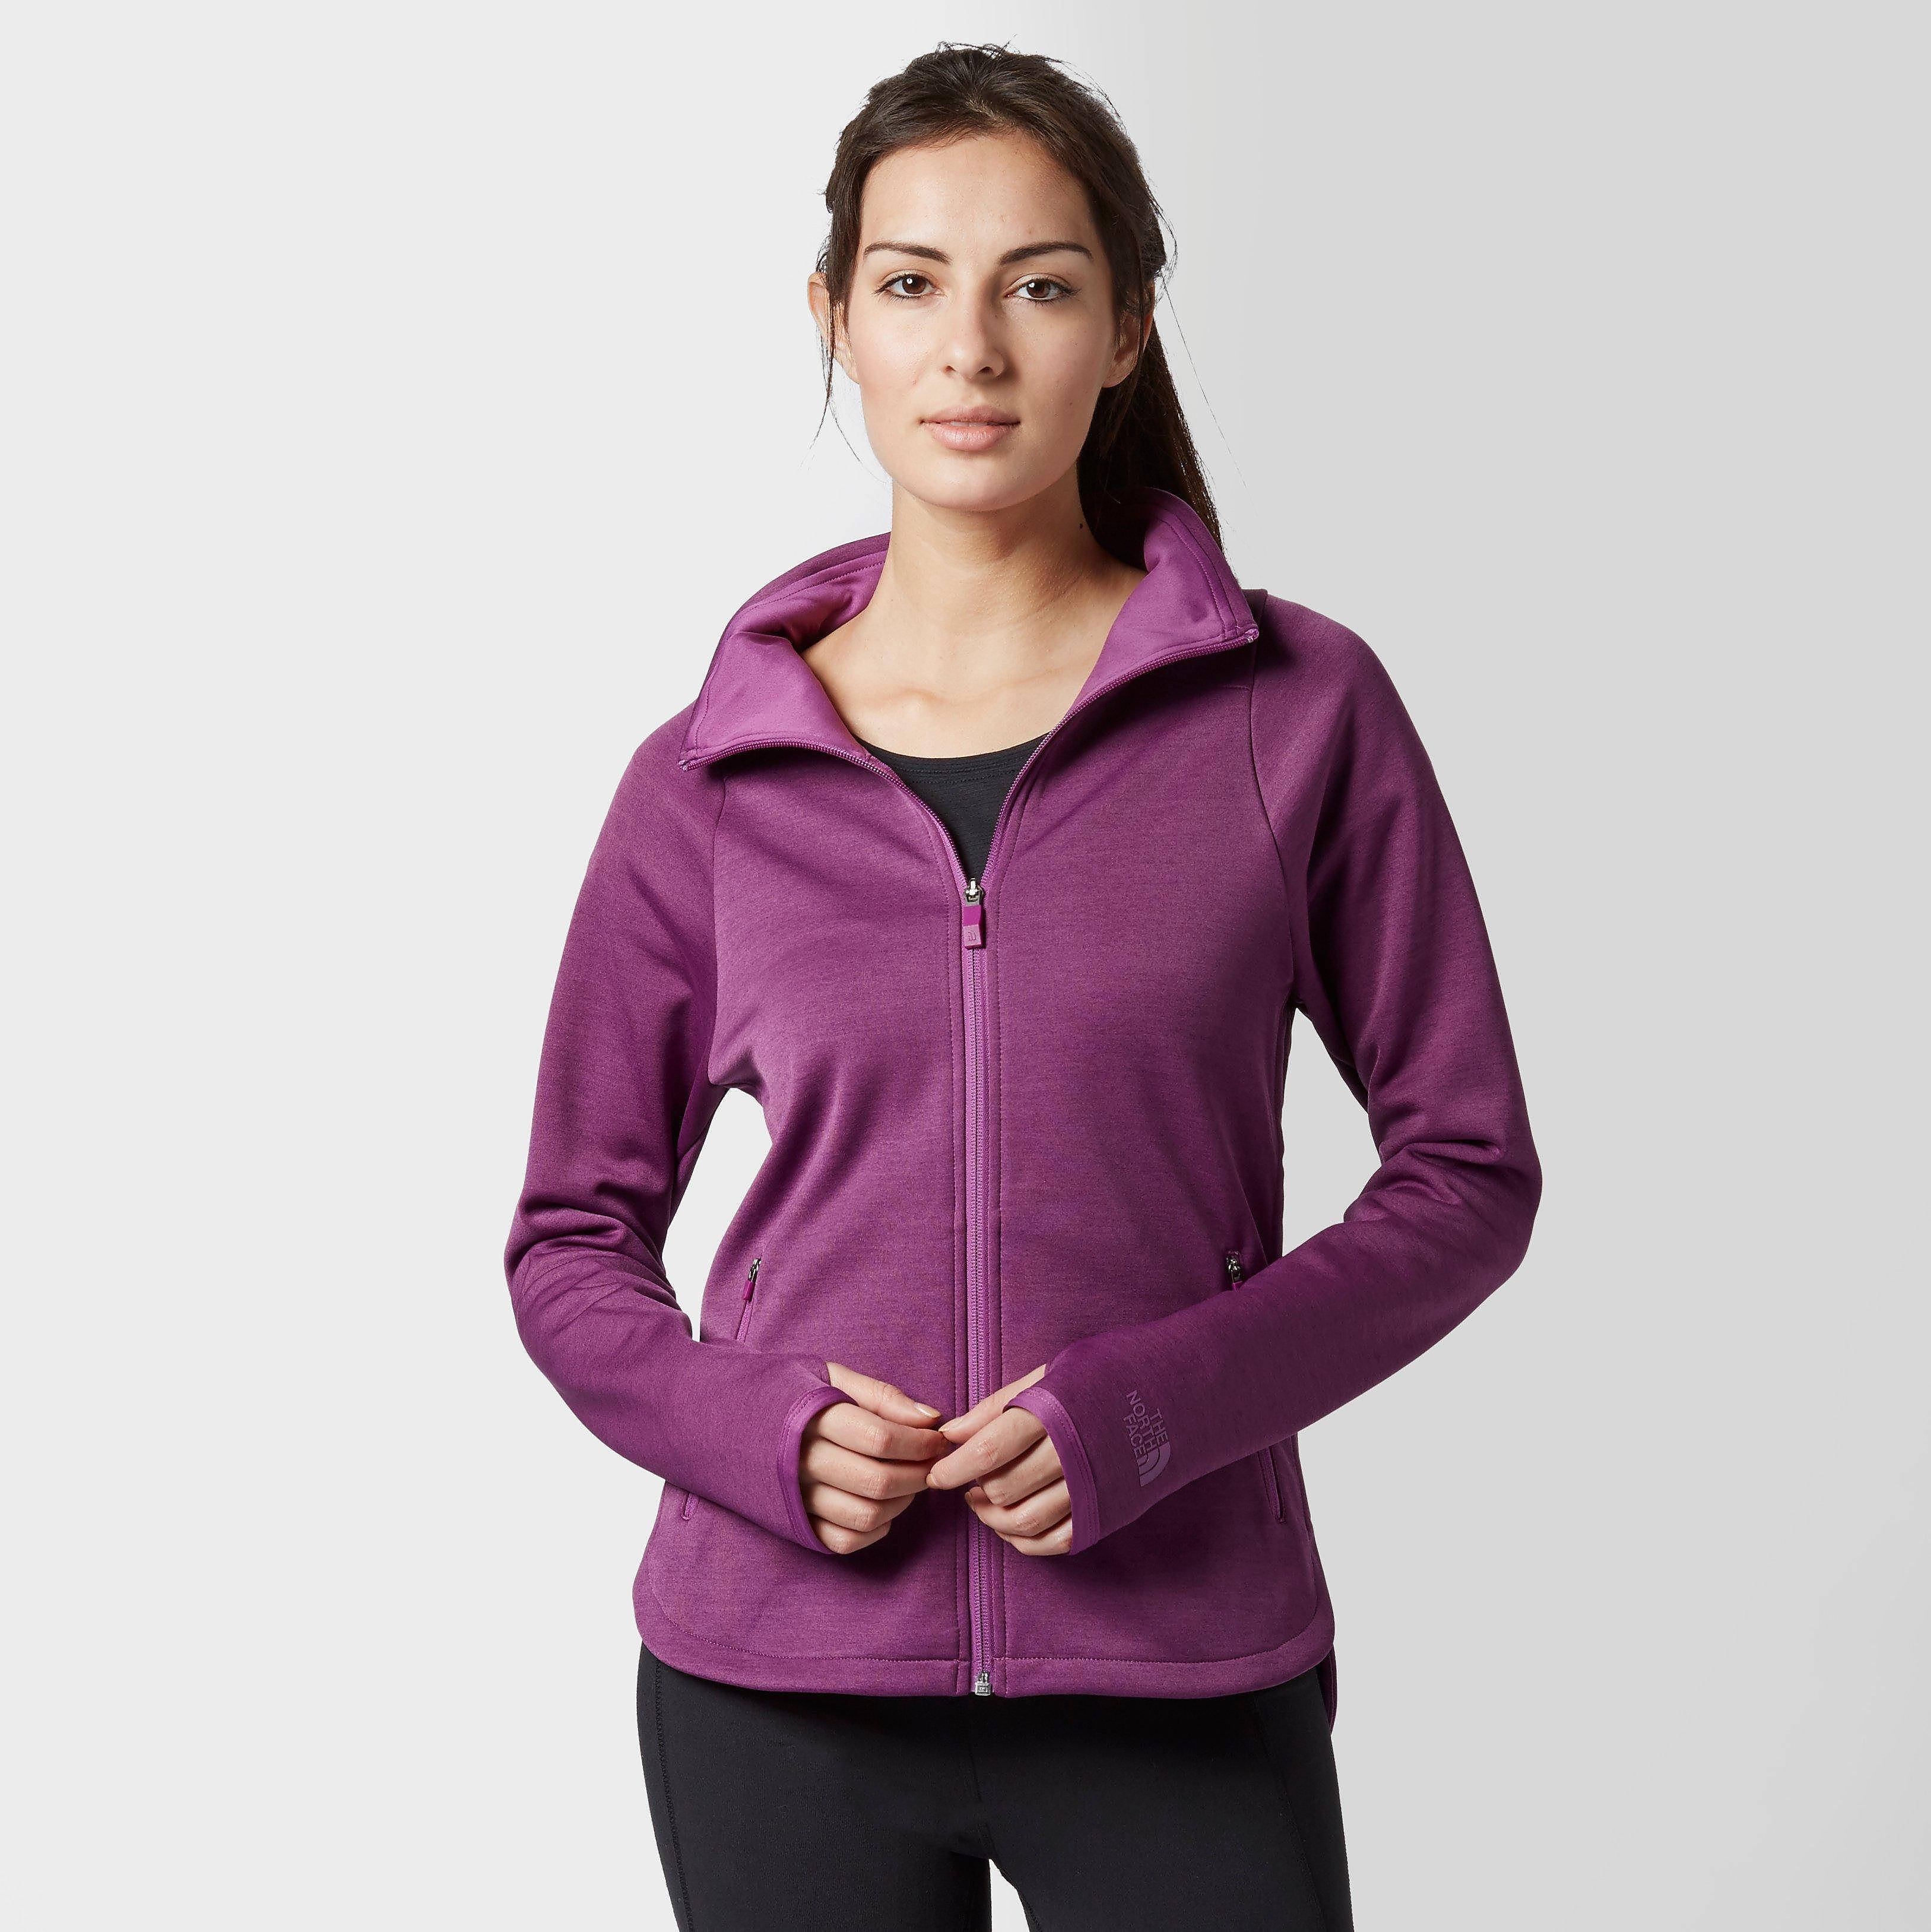 The North Face Versitas Women's Jacket